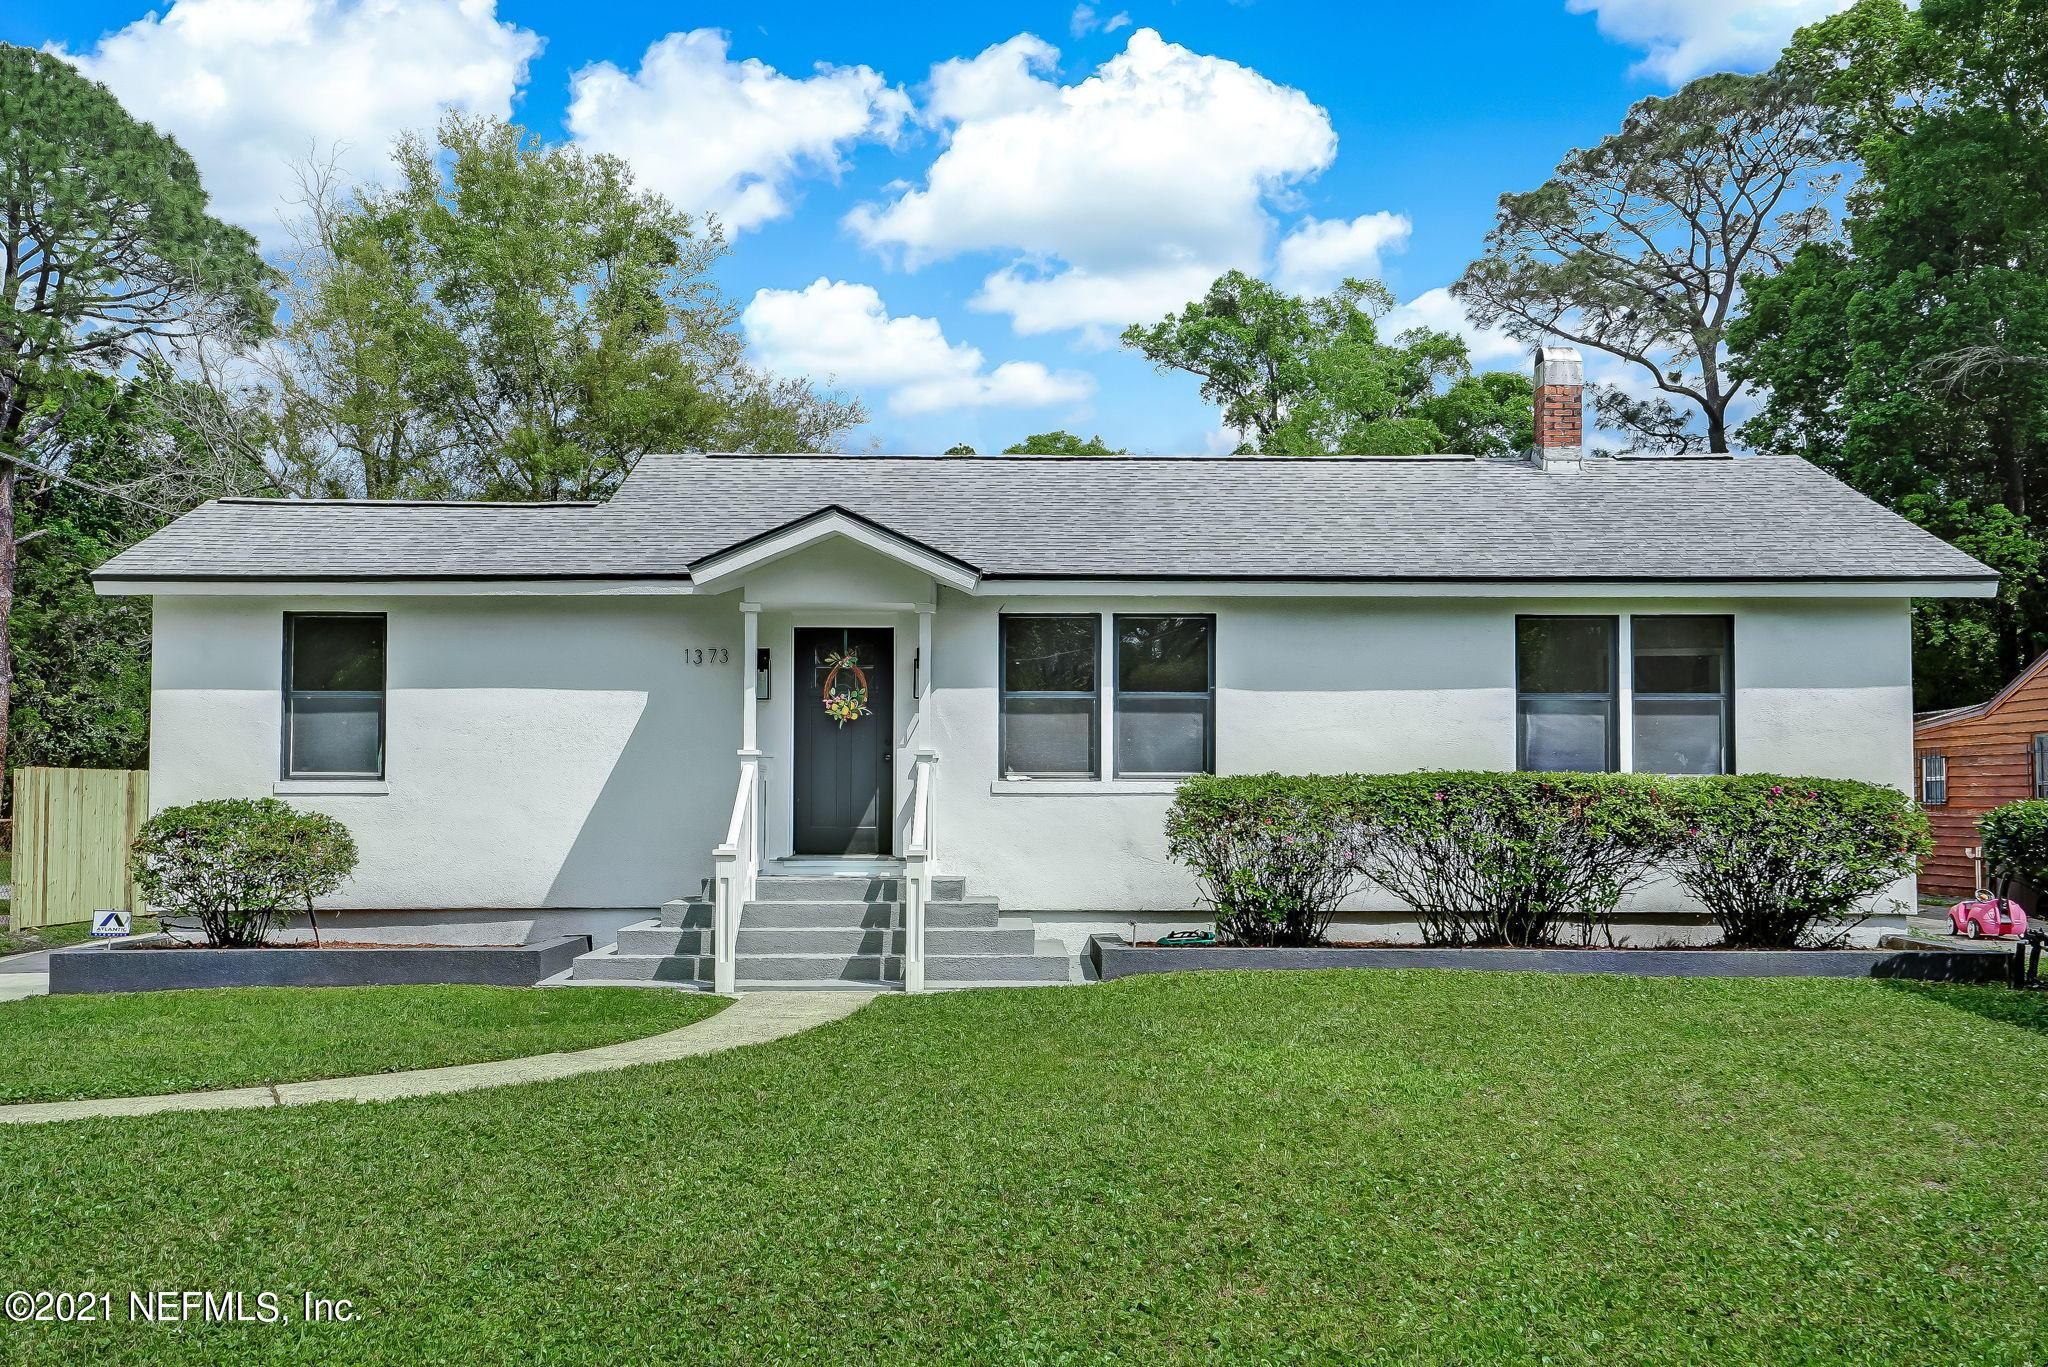 1373 Hamilton St Jacksonville, Fl 32205